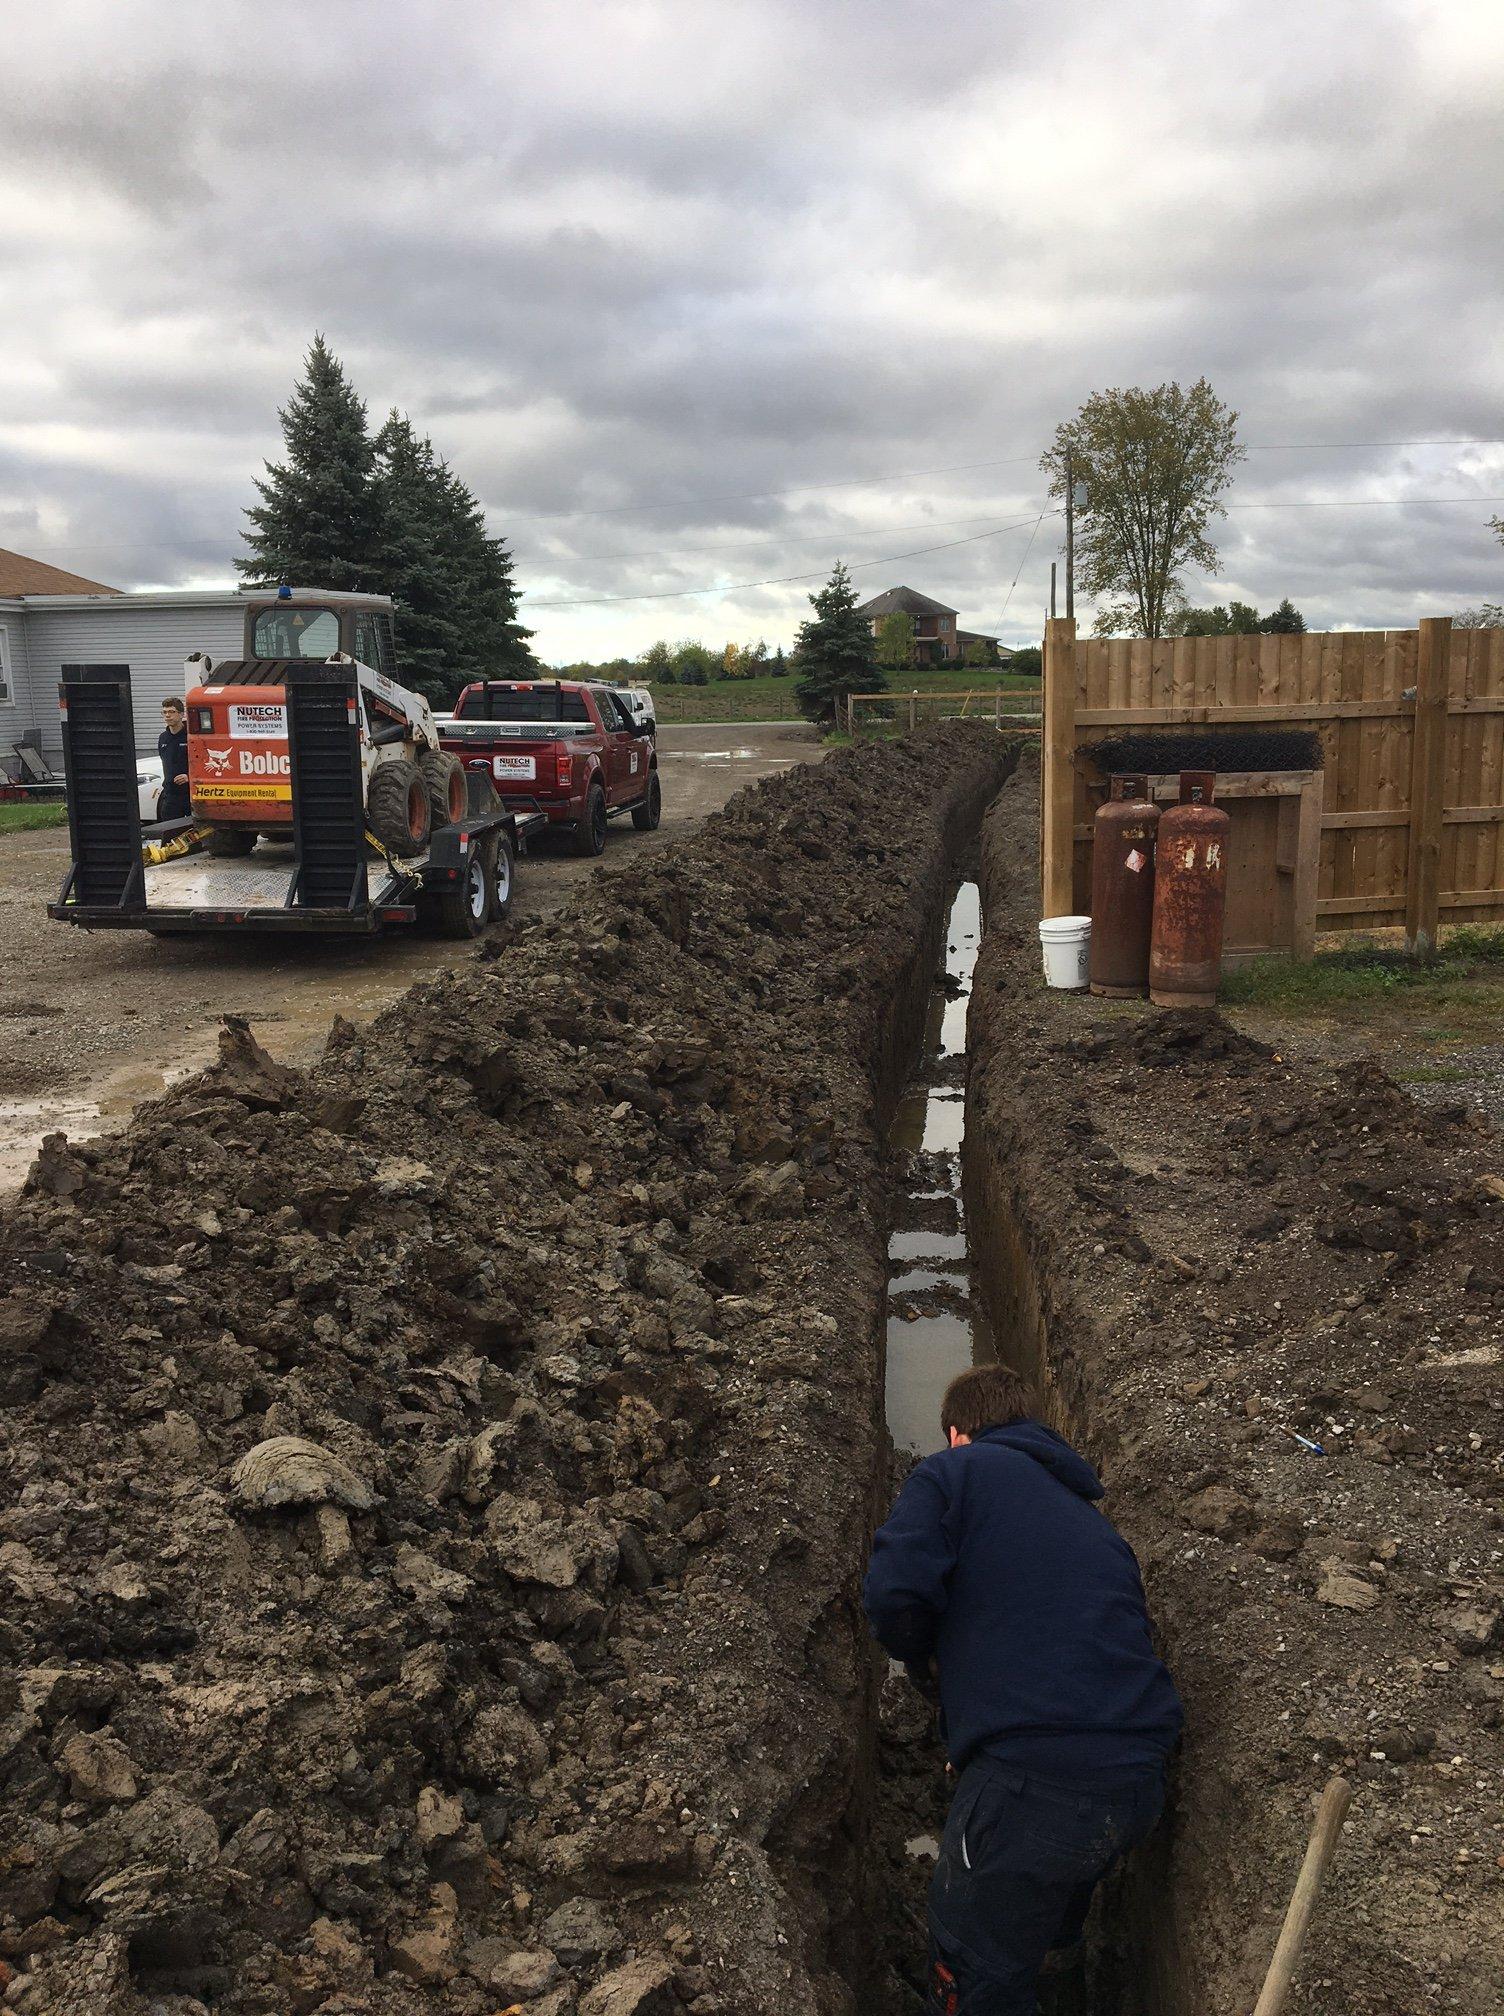 Bobcat excavators | trenching for utilities | water lines